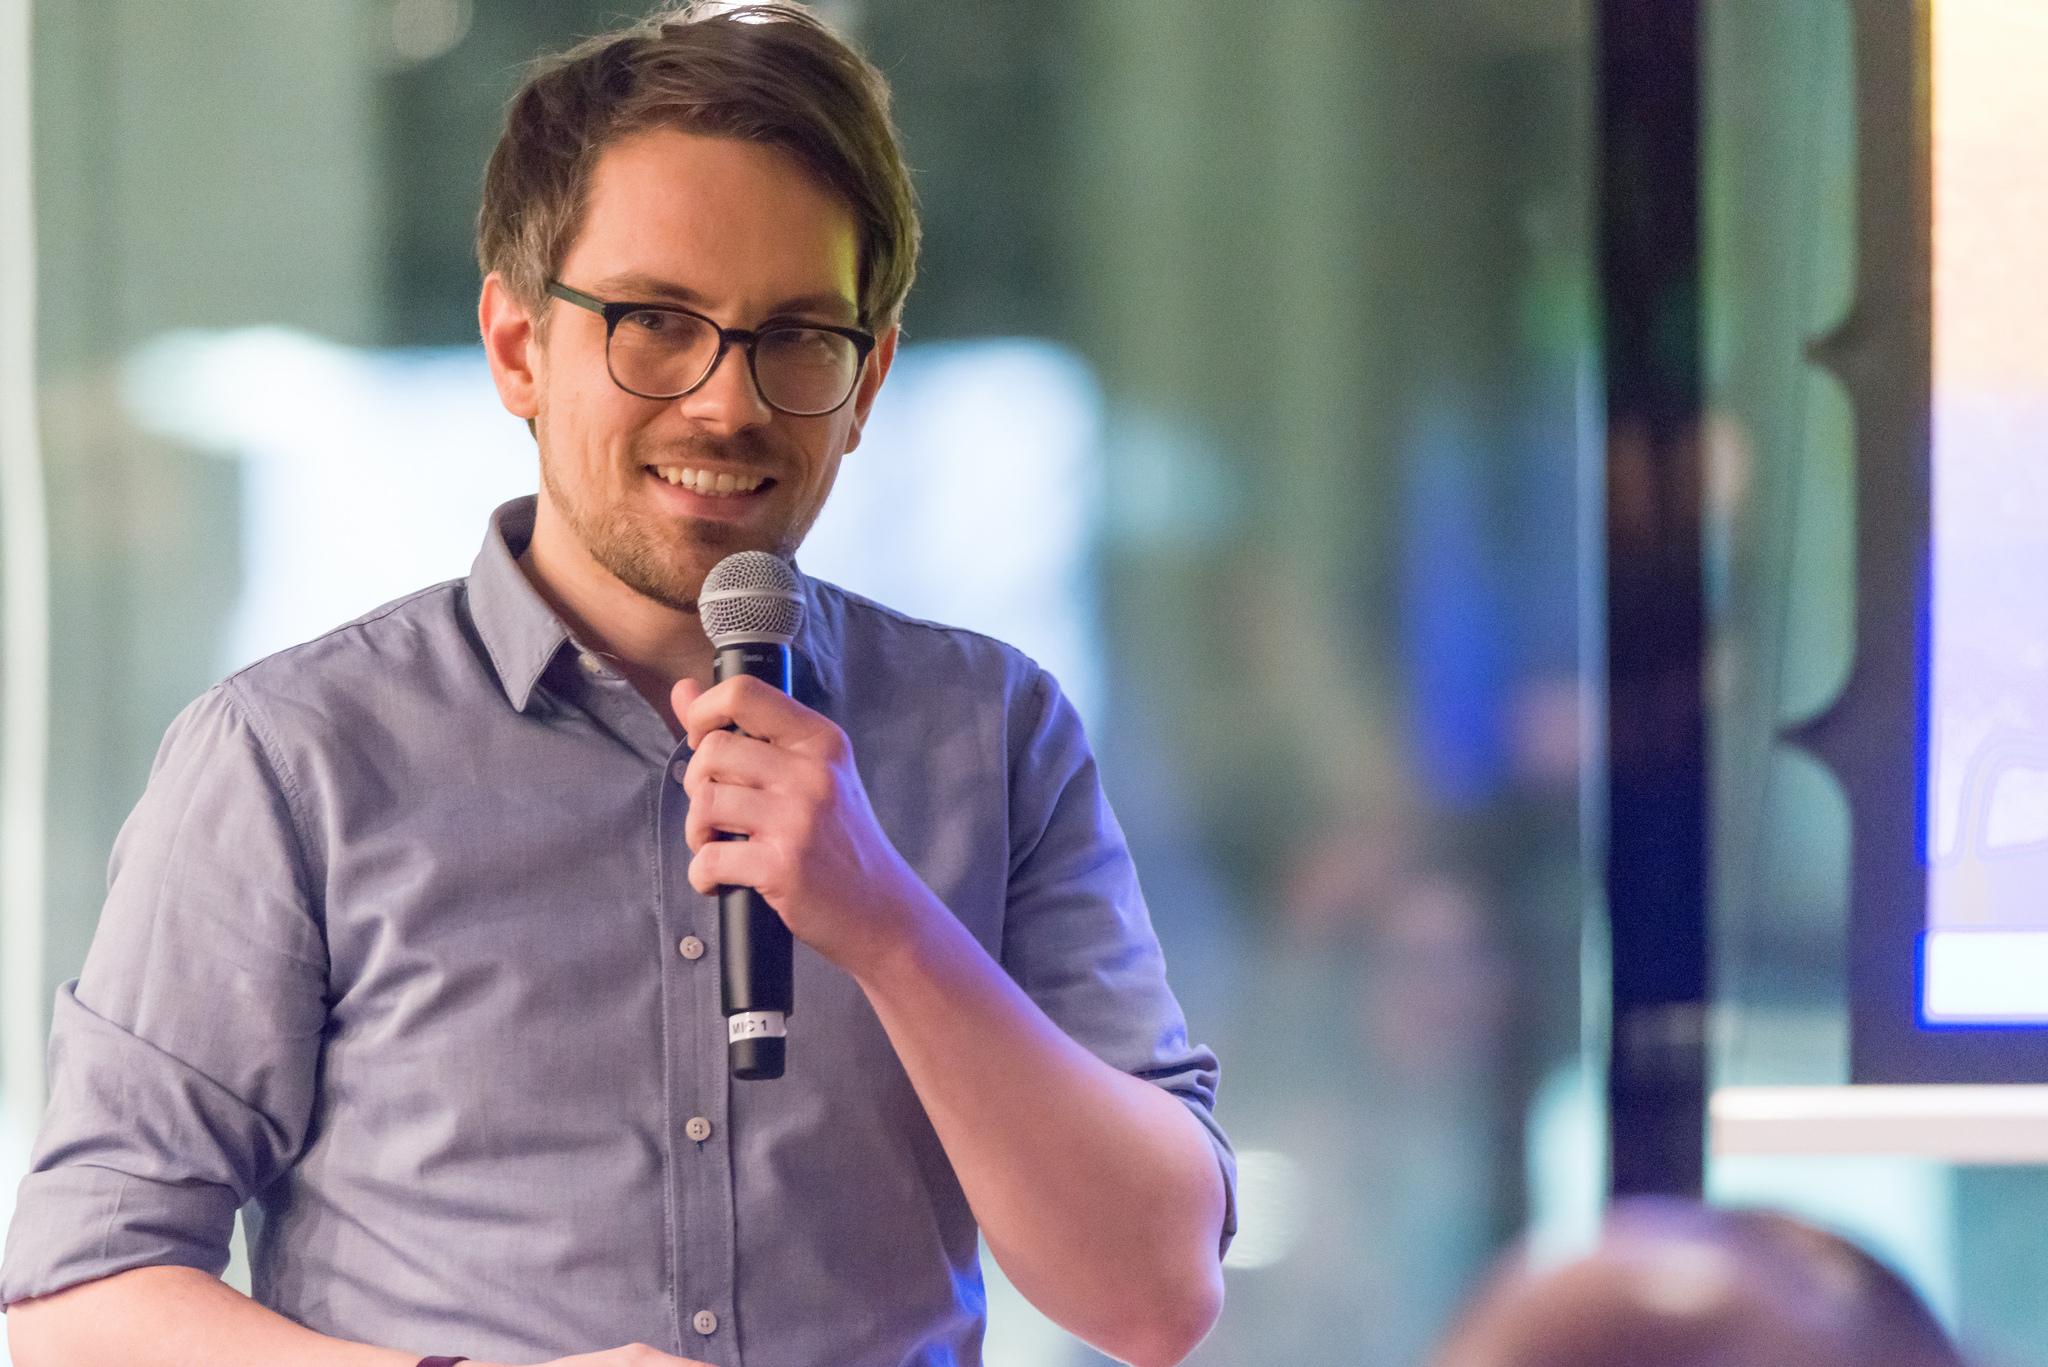 Johannes Baeck at IxDA Frankfurt 2018